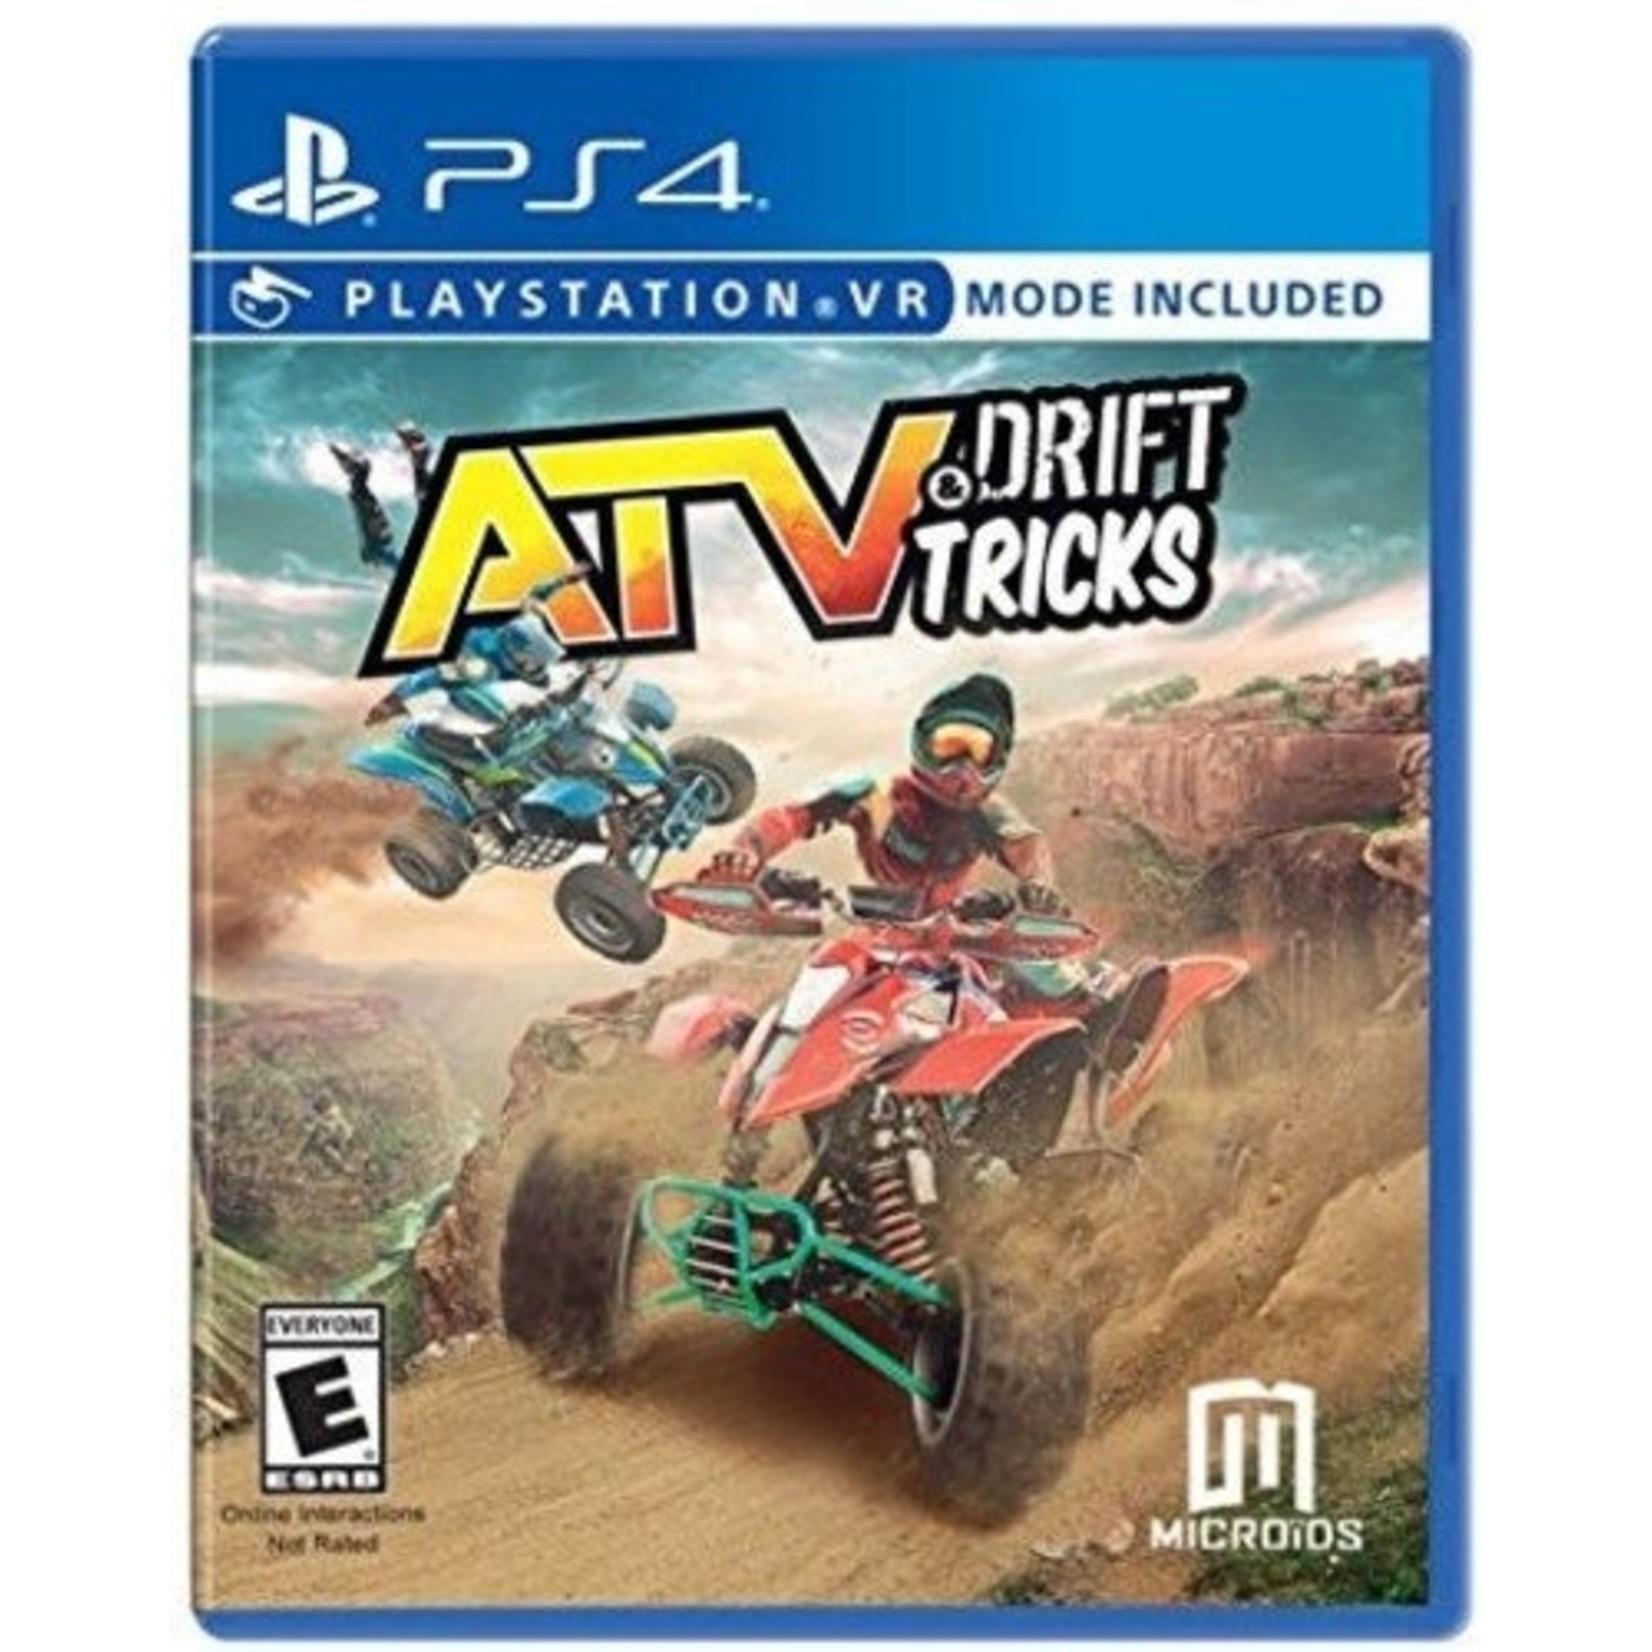 PS4U-ATV DRIFT & TRICKS